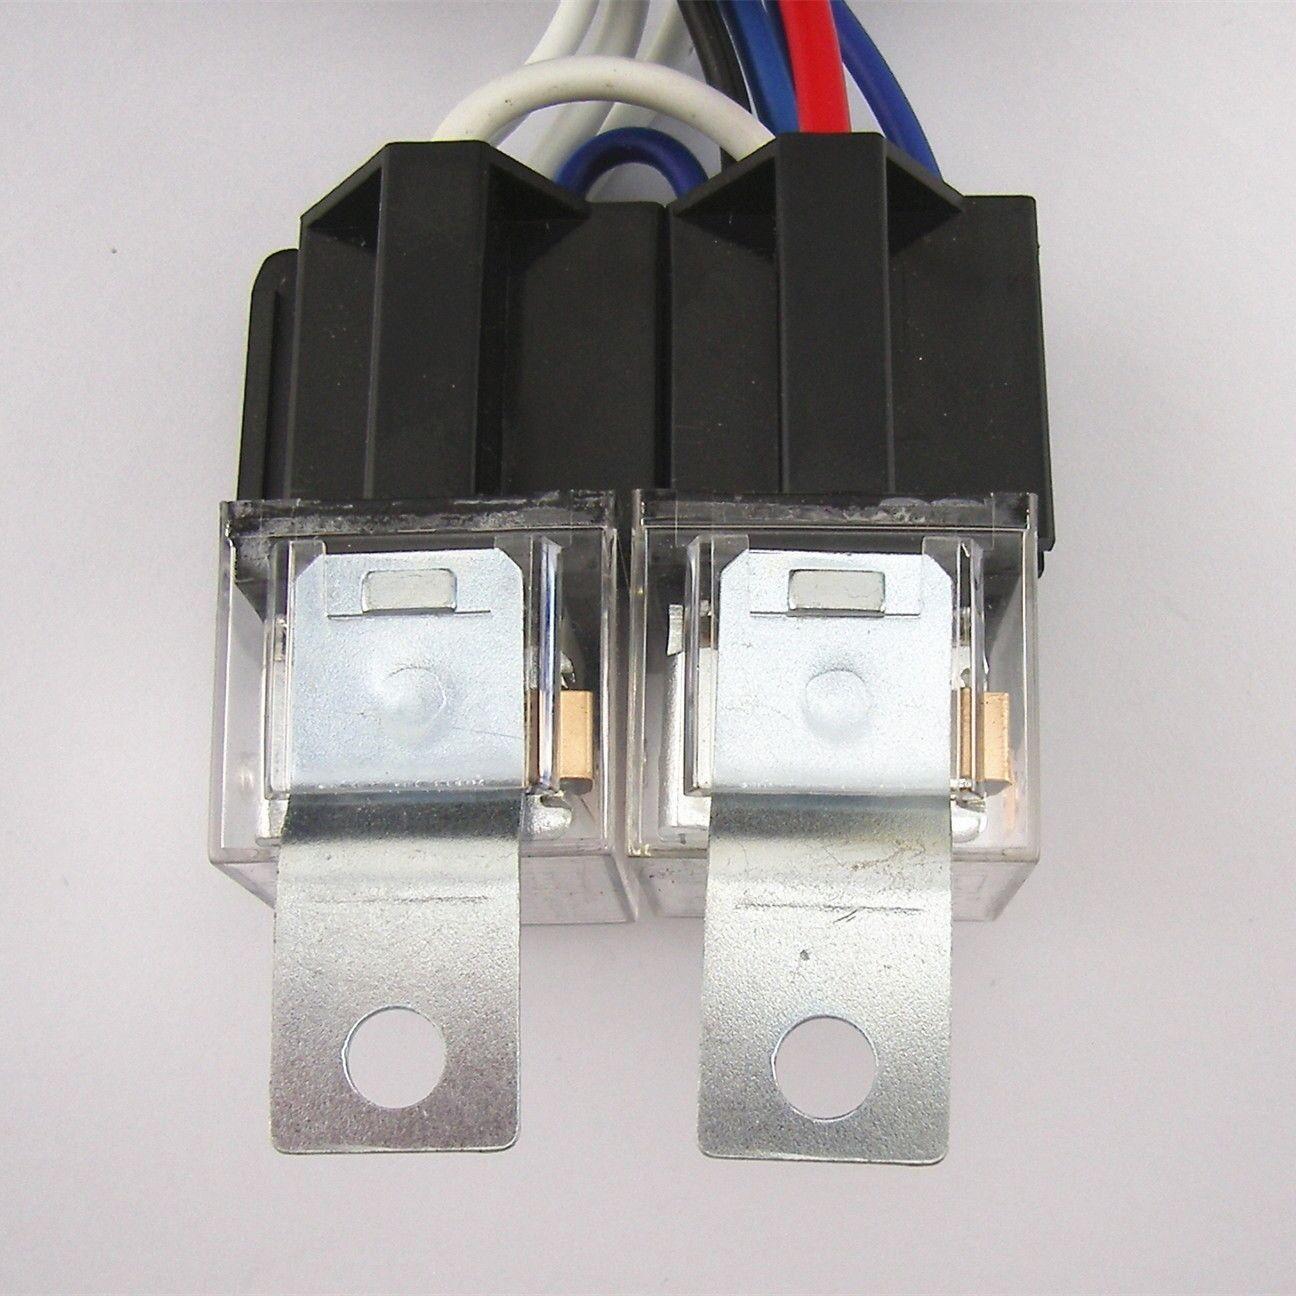 hight resolution of 4 headlight relay wiring harness h4 headlamp light bulb ceramic socket plugs set 2 2 of 12